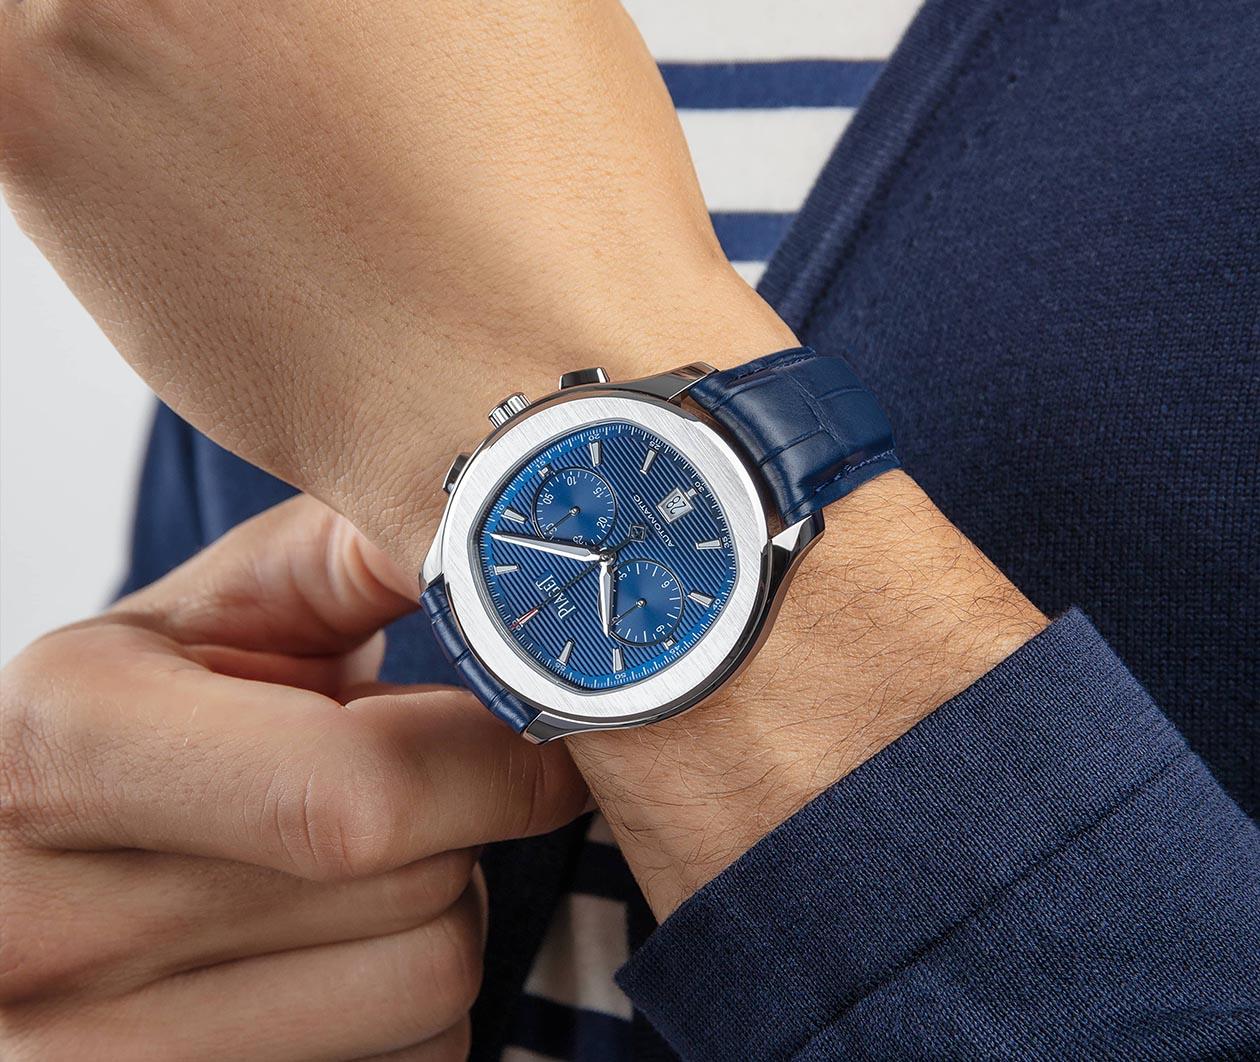 Piaget Polo watch G0A43002 Carousel 2 FINAL